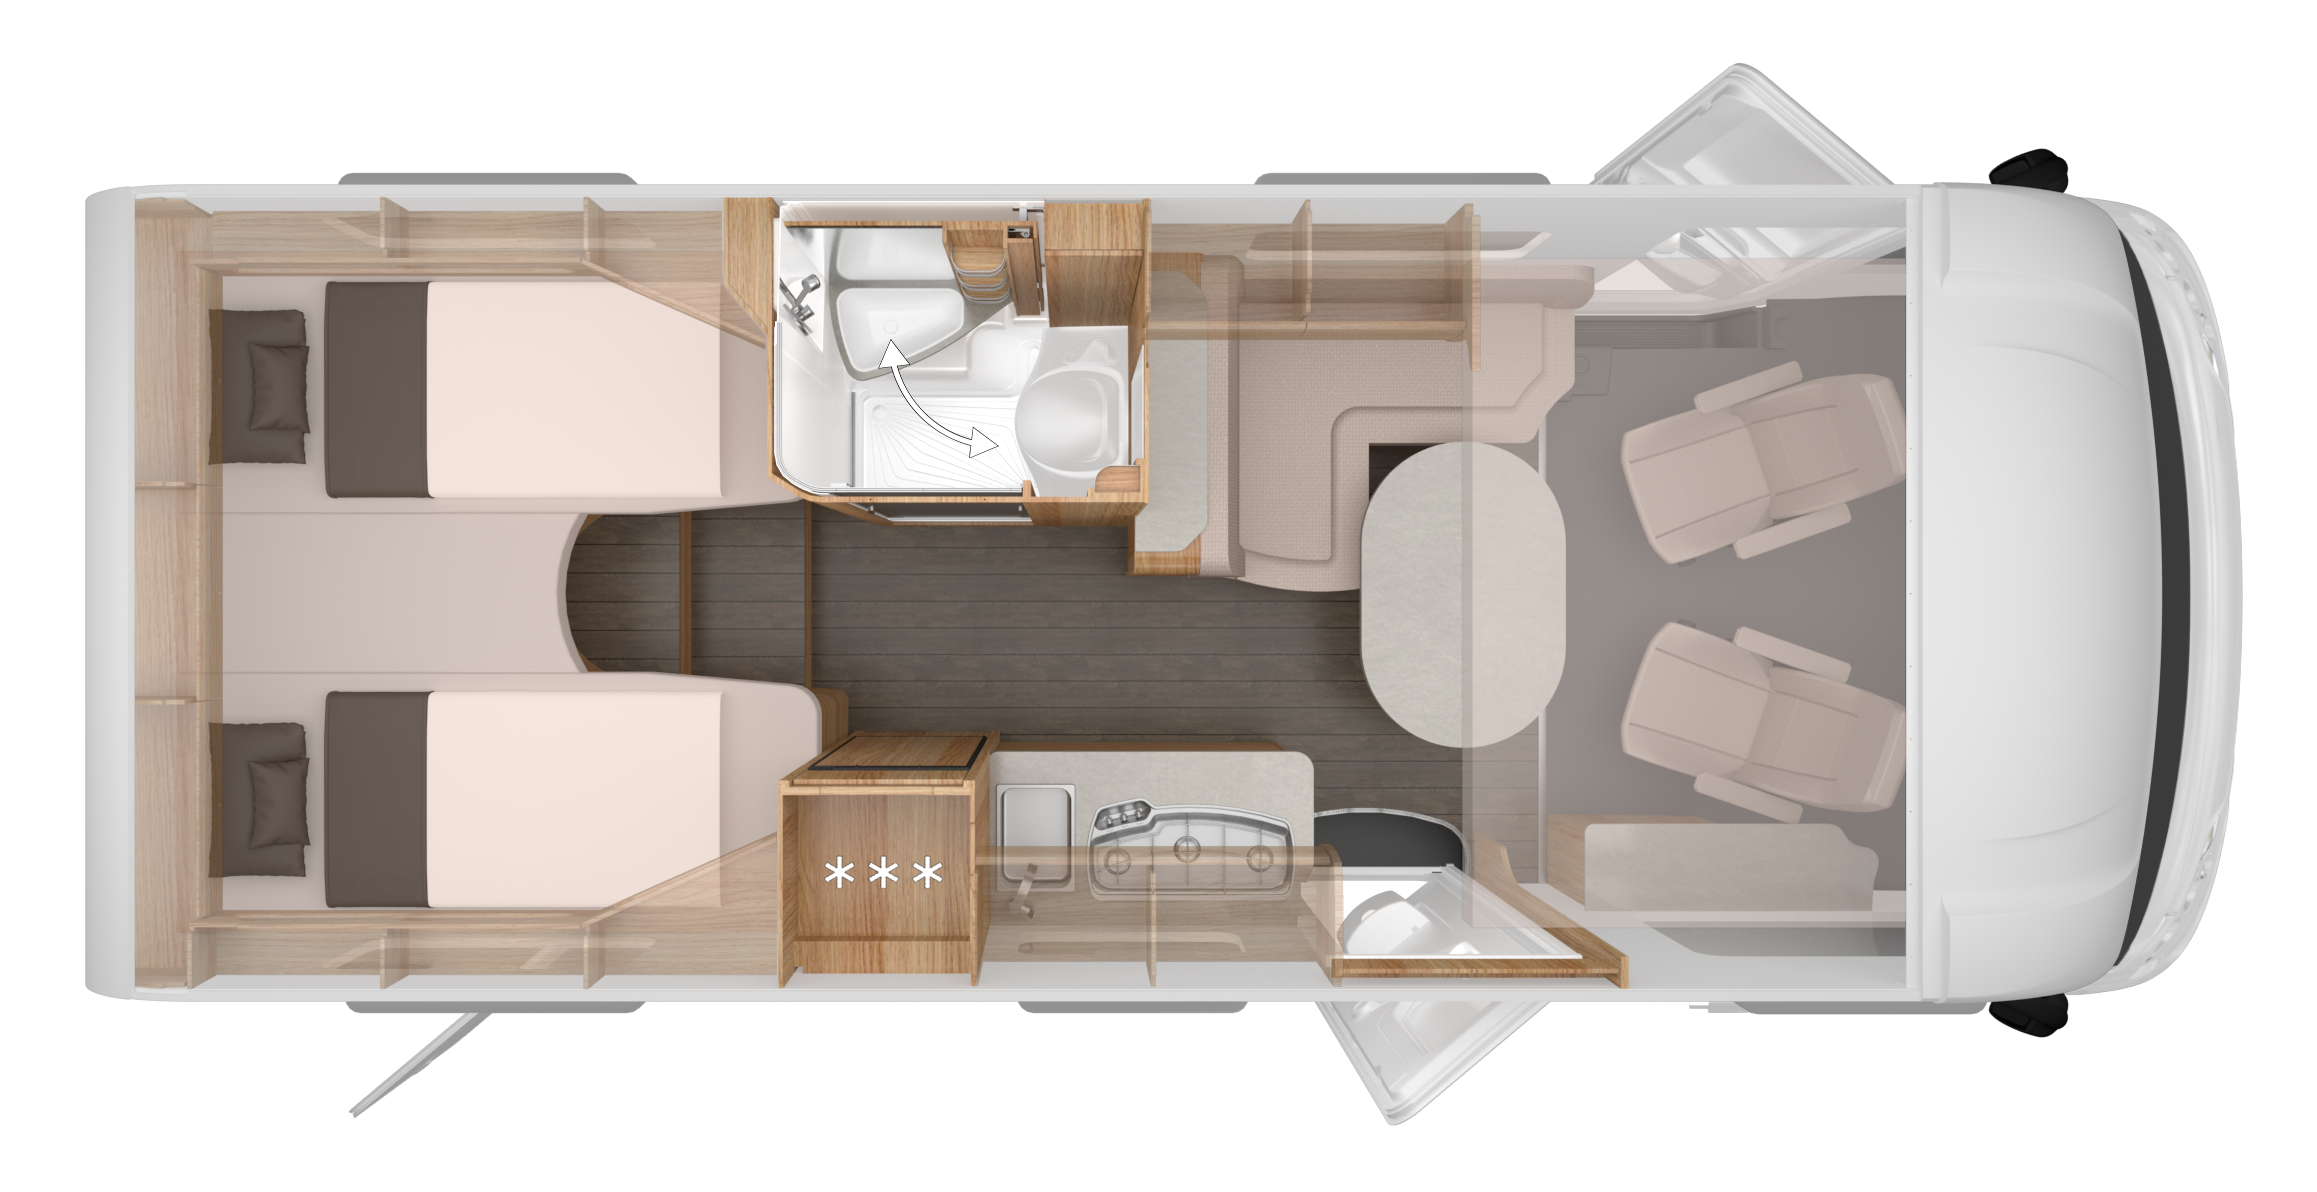 SKYI - 650_LEG_KNAUS_CAMPER_I4